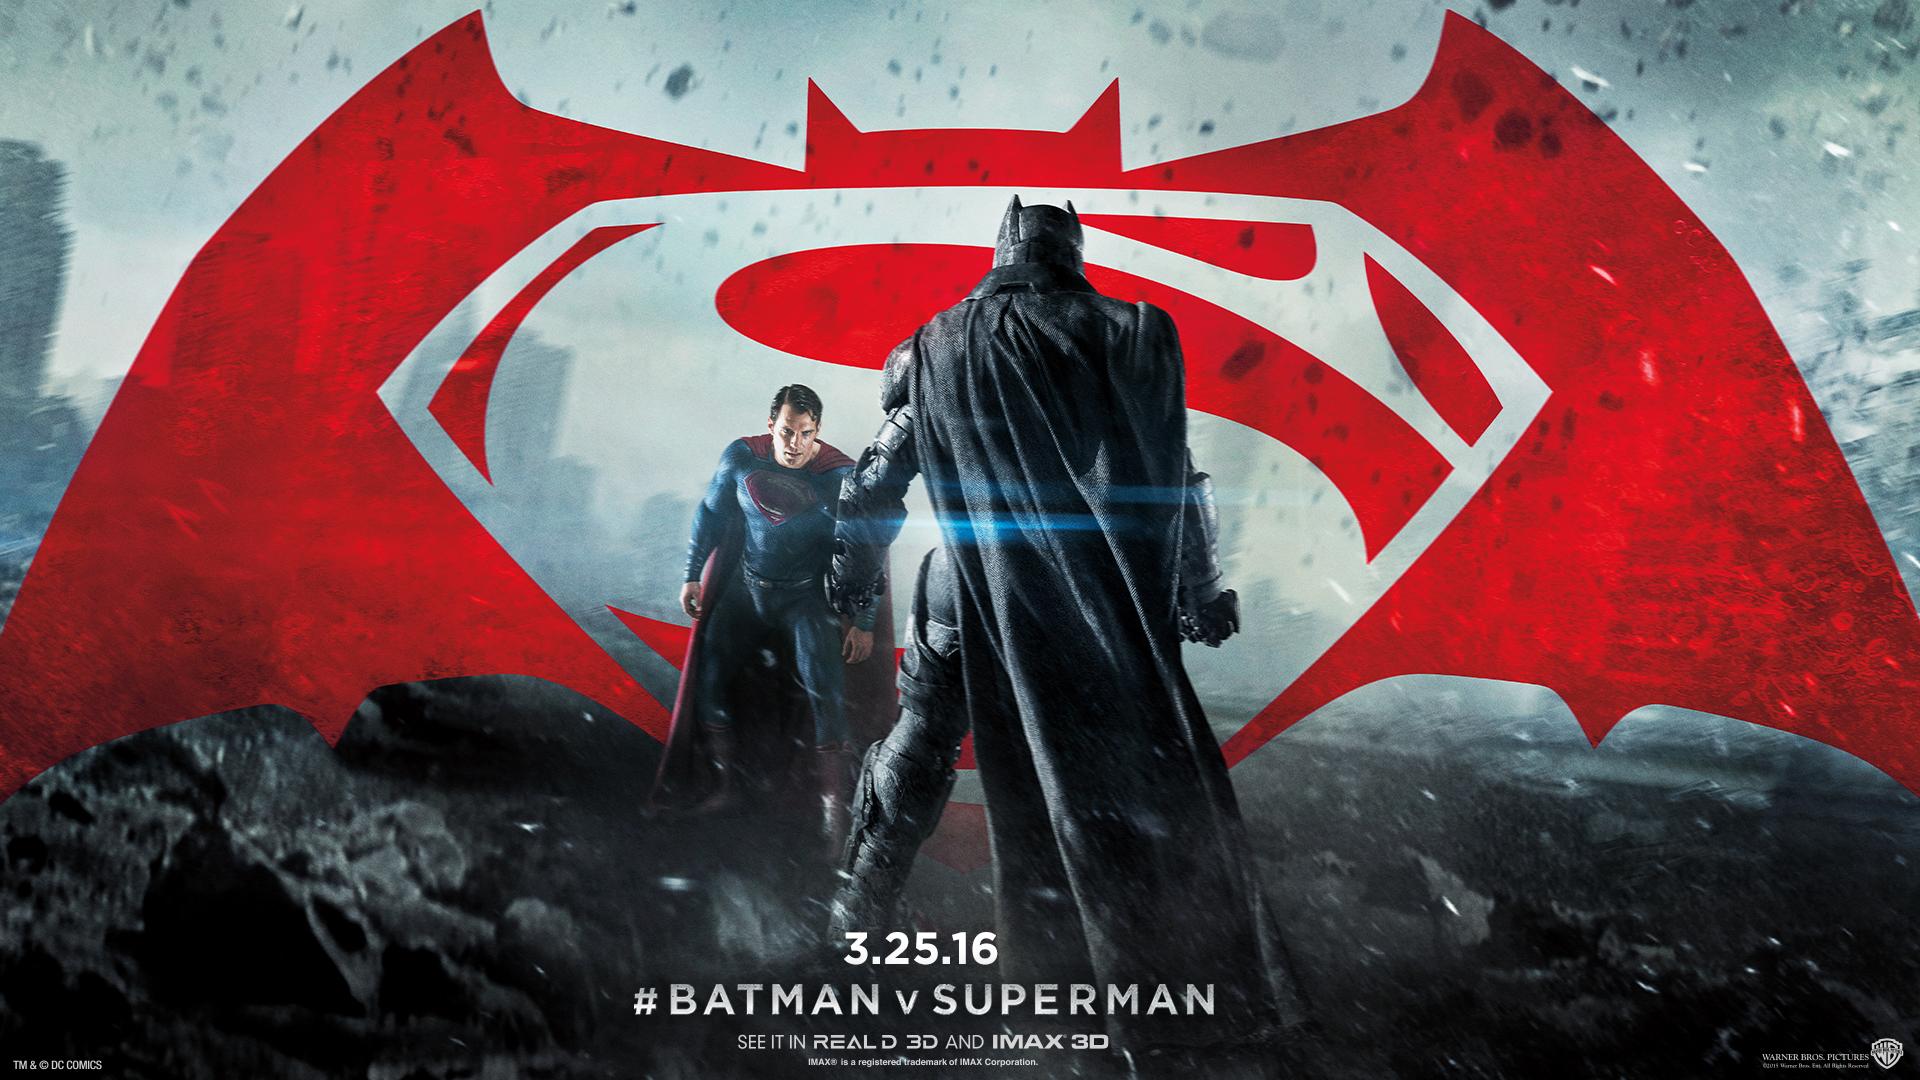 Batman_v_Superman_Dawn-of_Justice_wallpapers-8.jpg